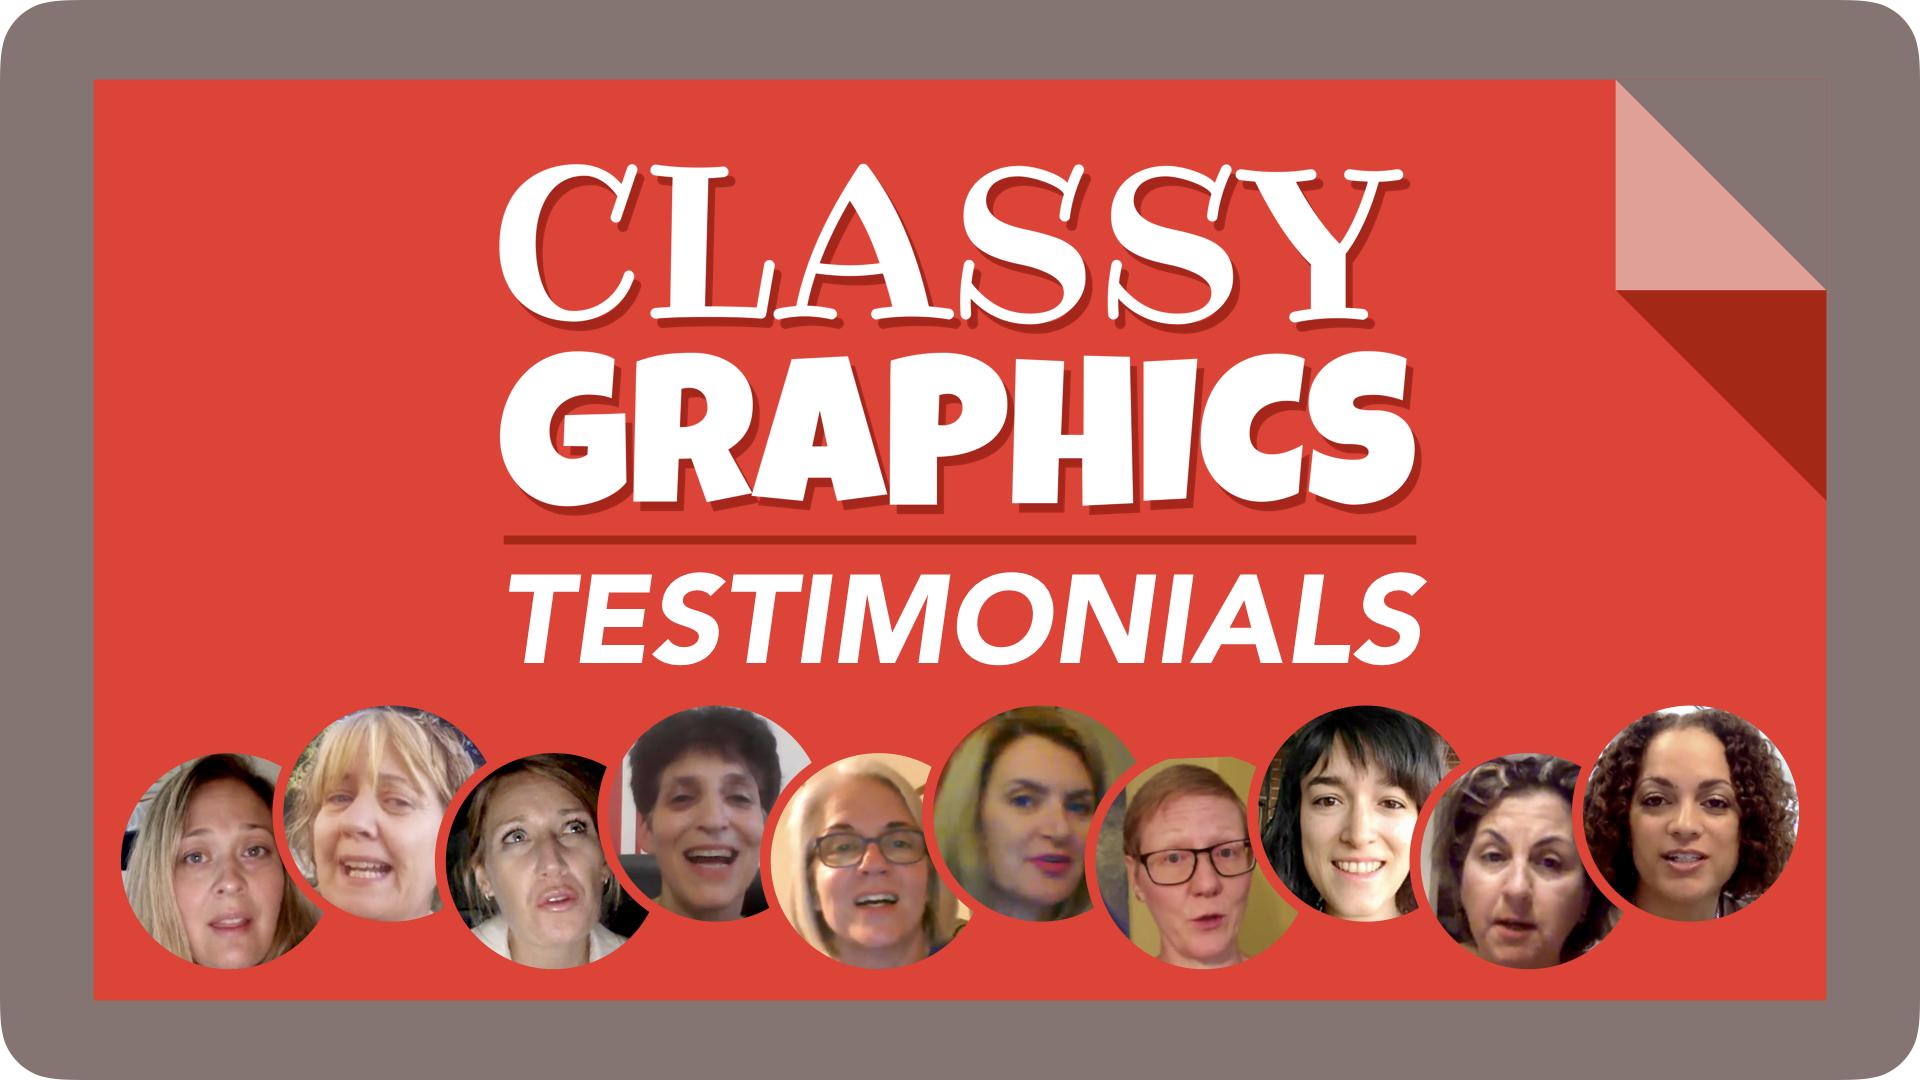 Classy Graphics Testimonials